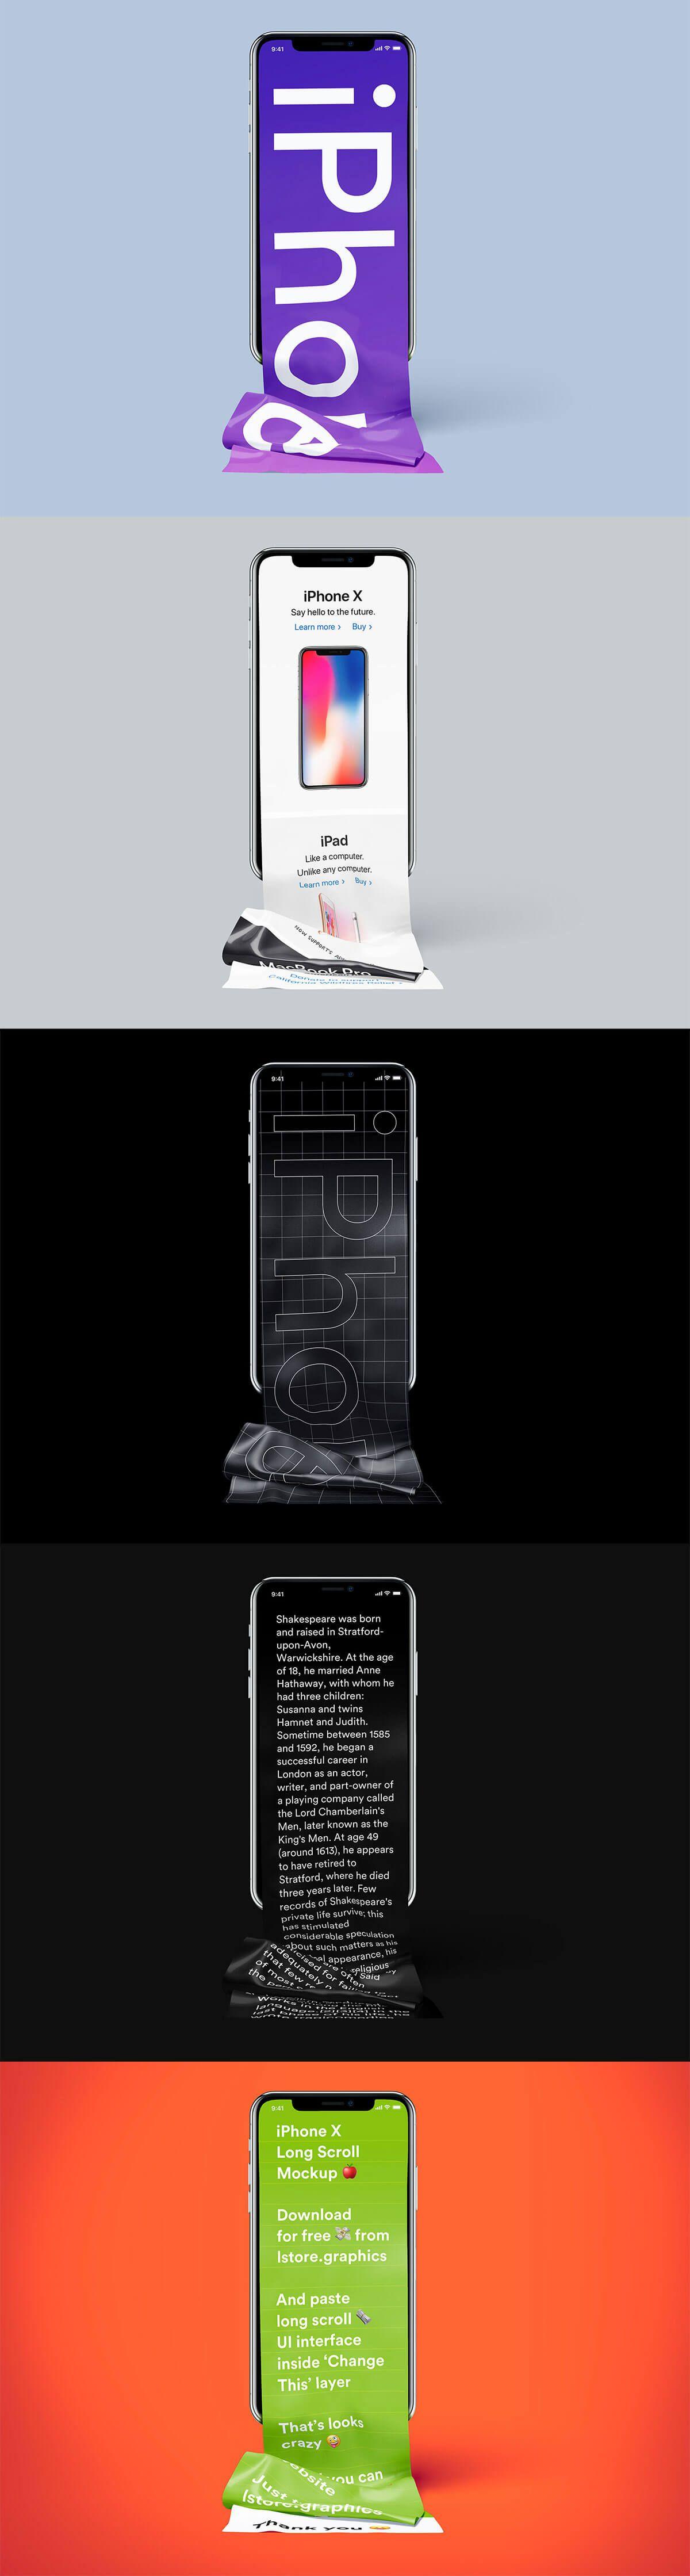 Free Long Scroll Iphone X Mockup Mockup Phone Mockup Web Design Inspiration